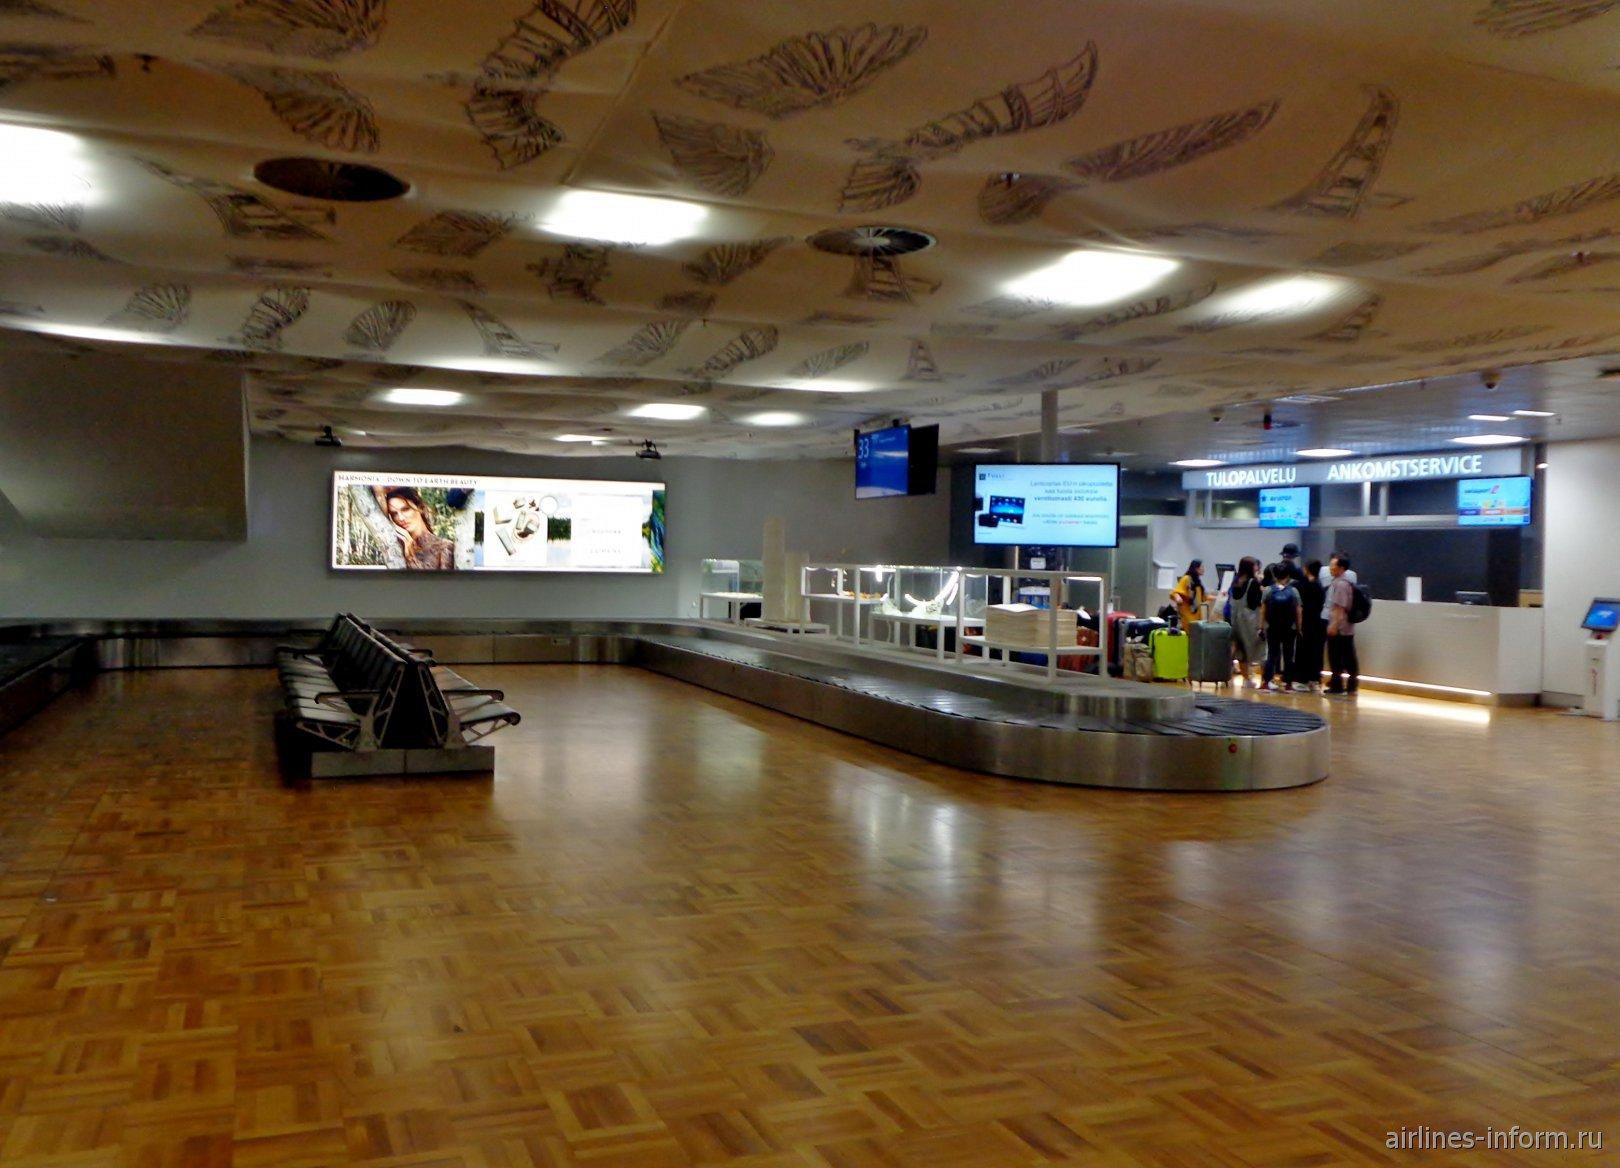 Зал выдачи багажа в терминале 2 аэропорта Хельсинки Вантаа